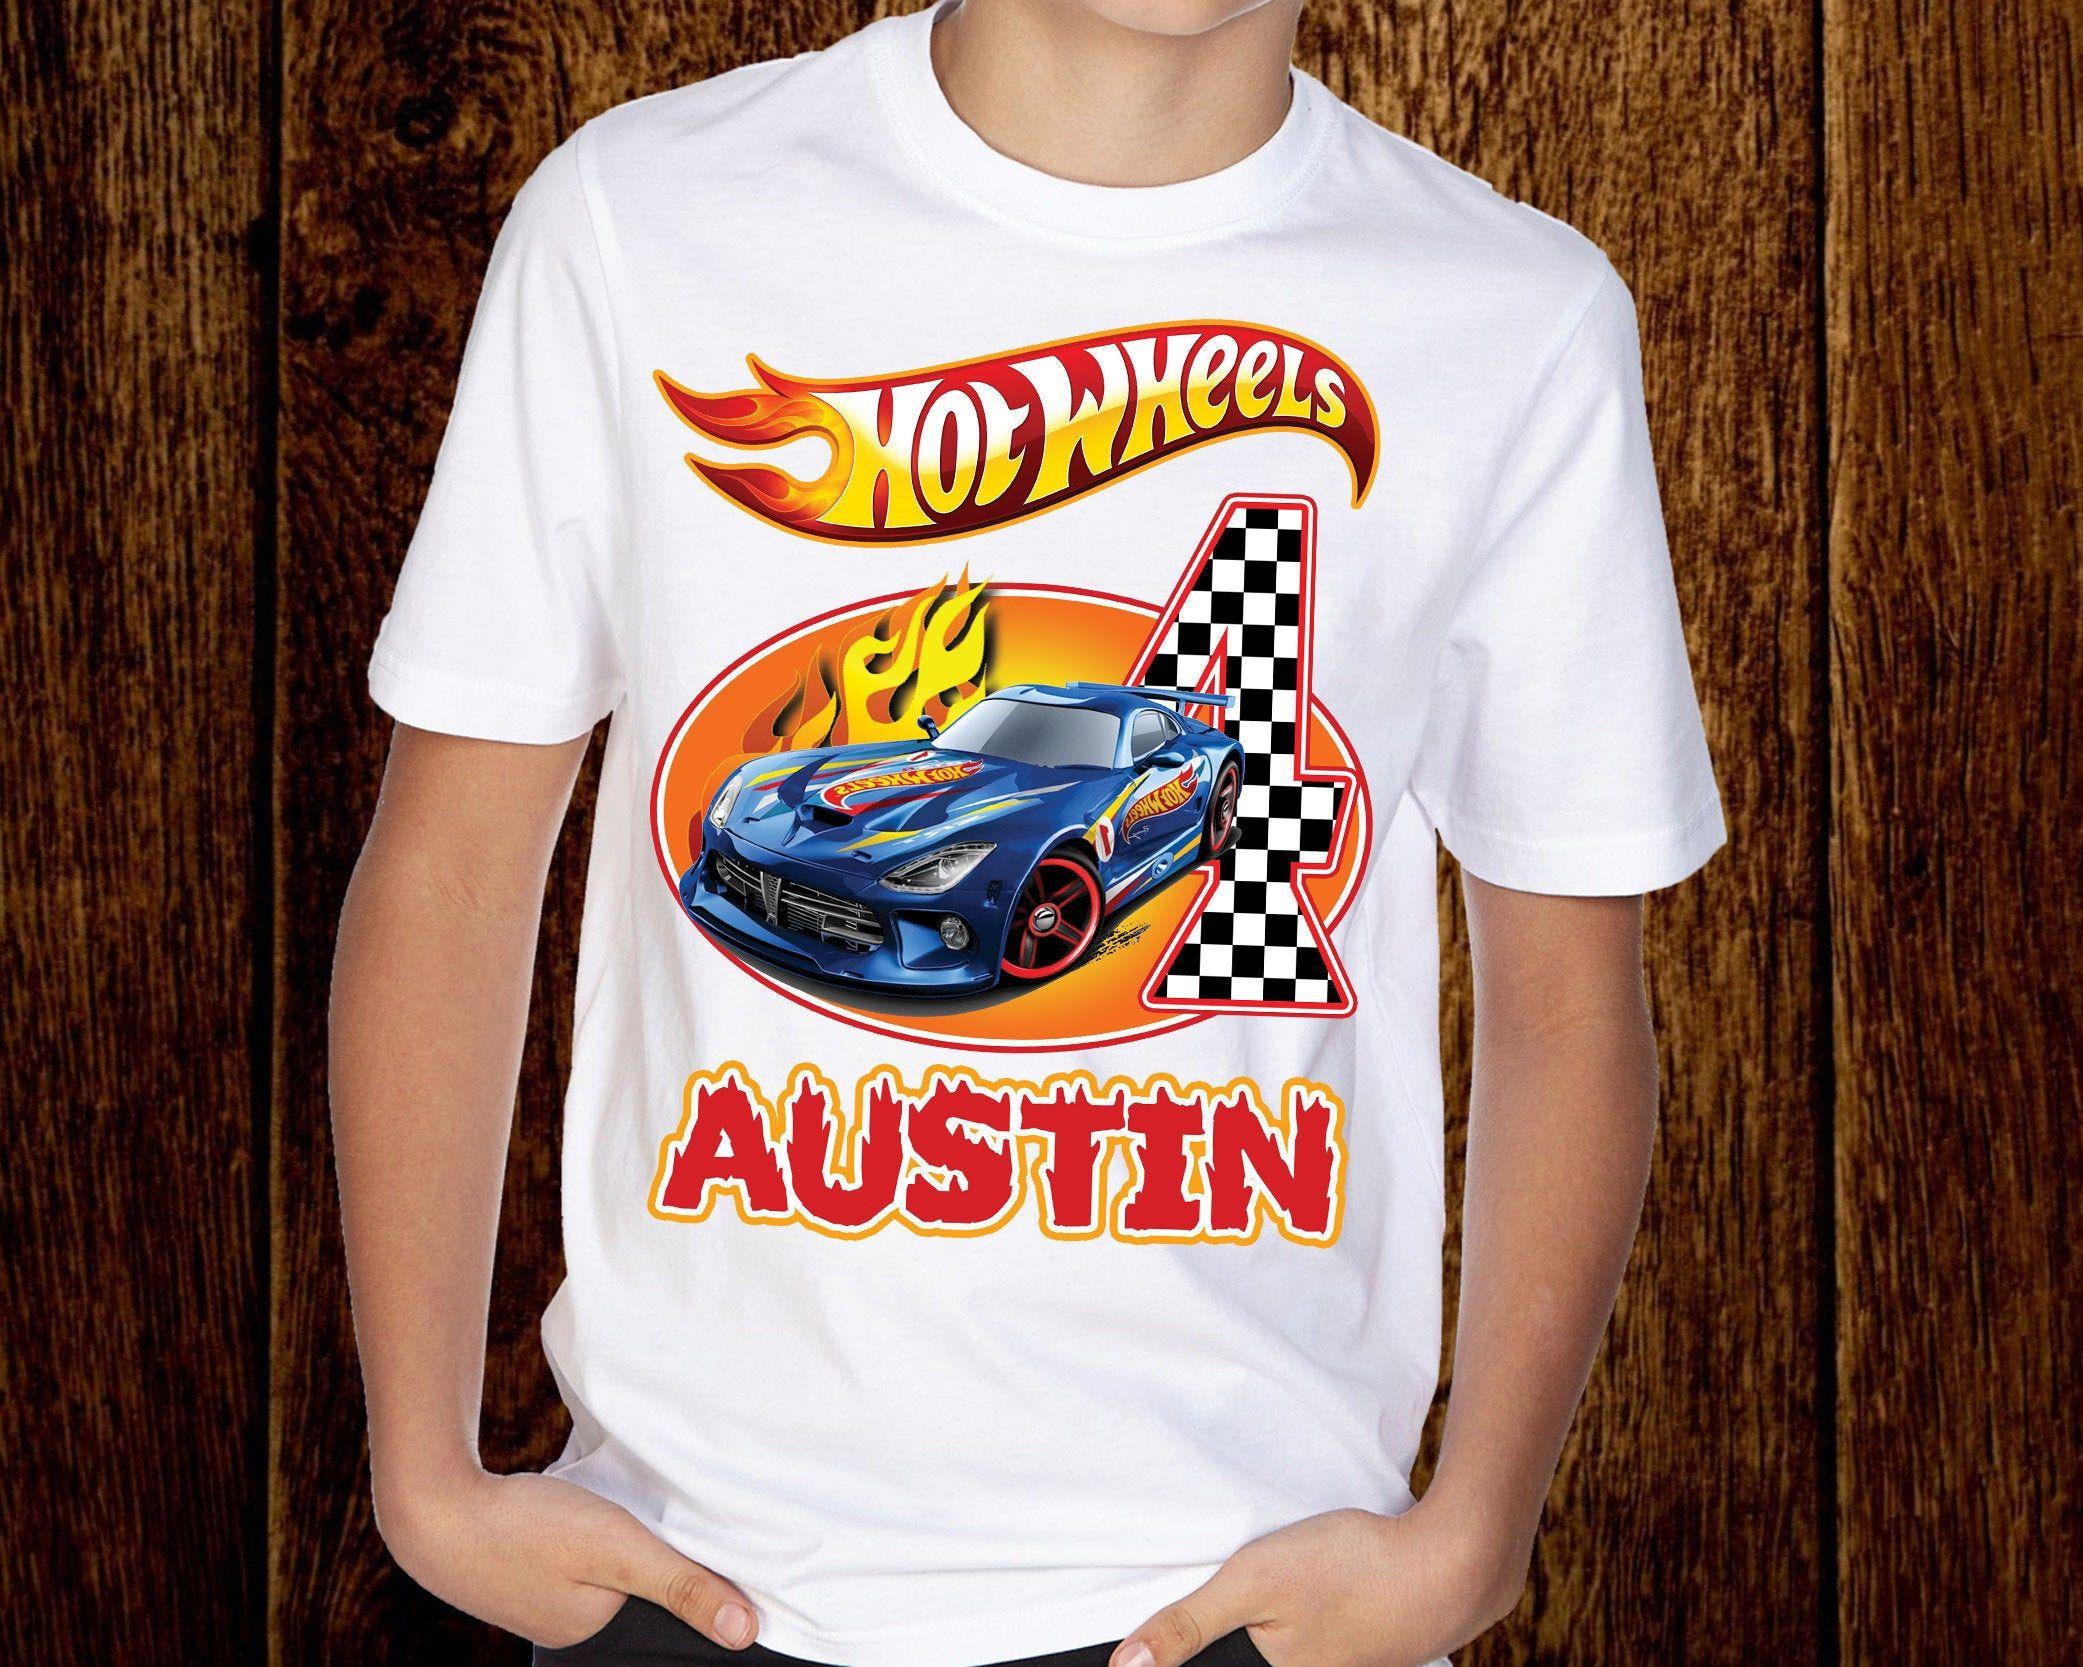 Hot Wheels Birthday  T-shirts Hot wheels Birthday Tees. Hot Wheels Birthday T-shirts